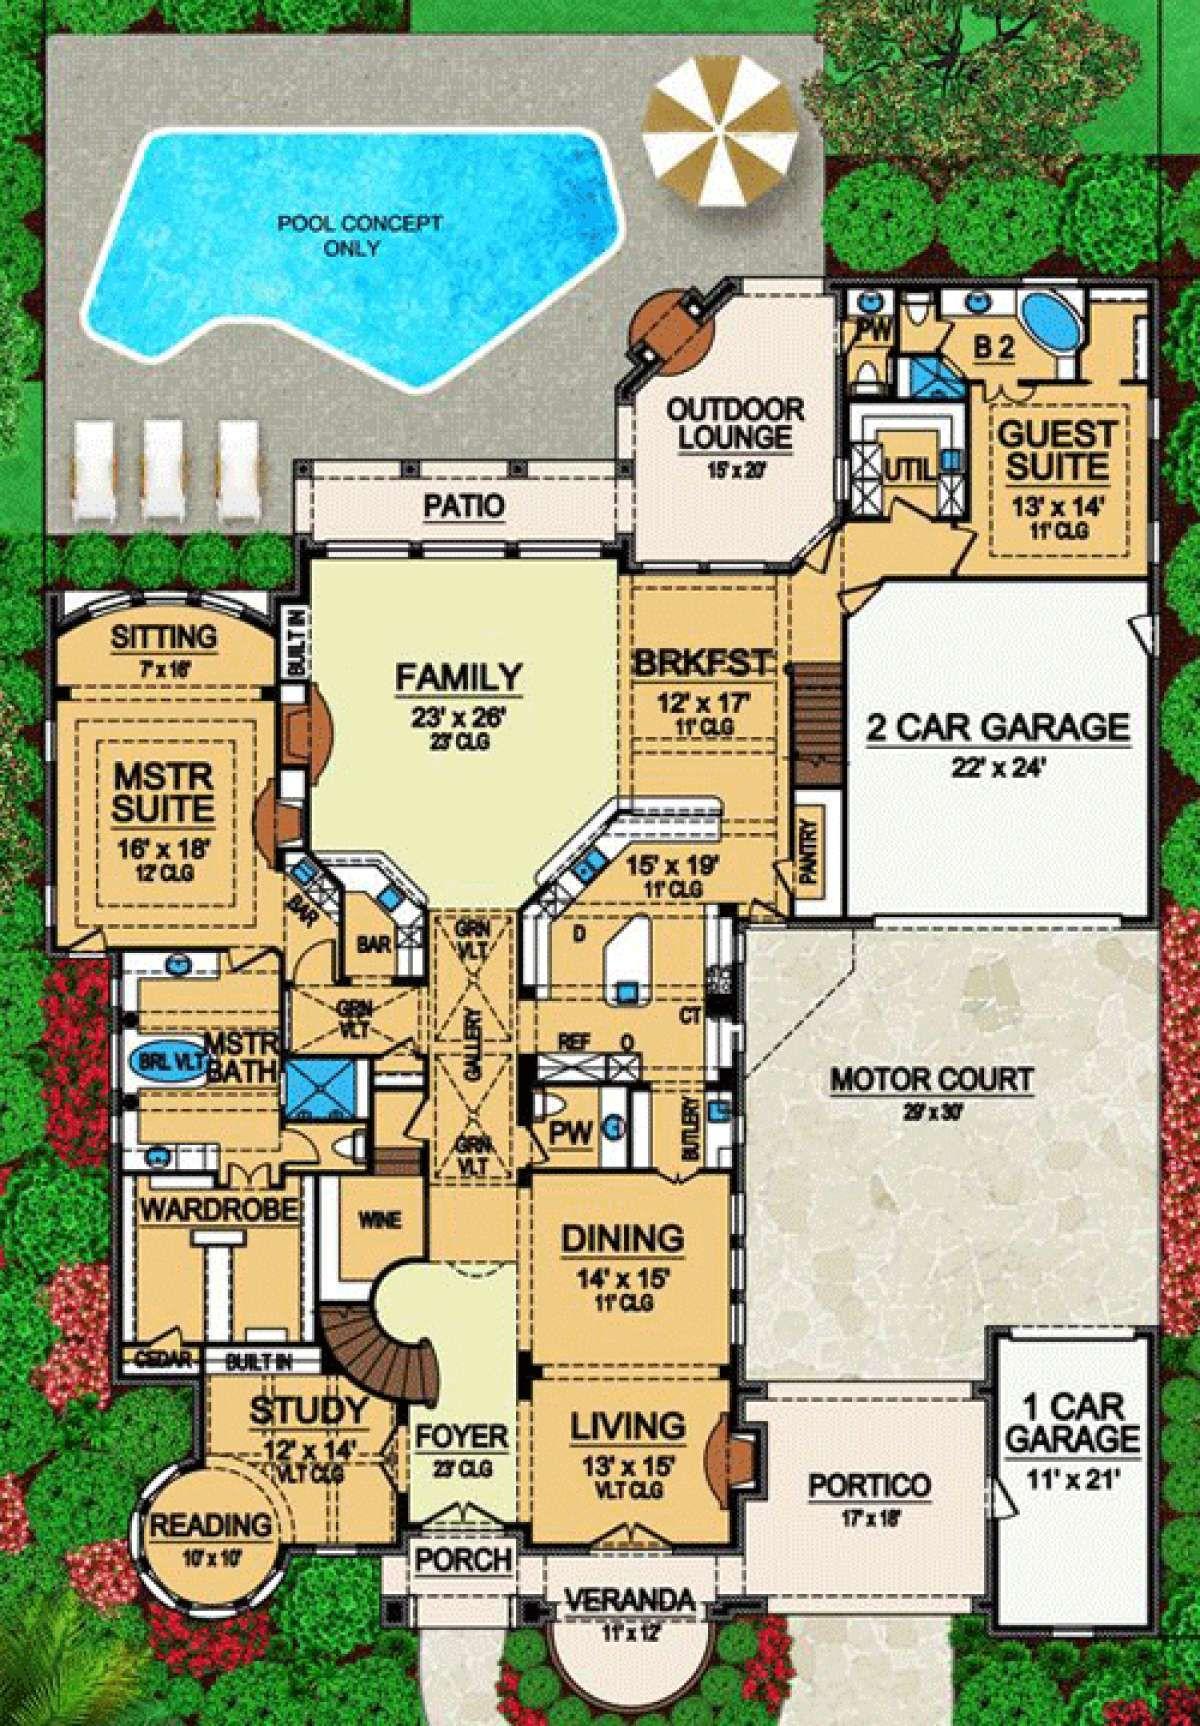 House Plan 5445 00083 European Plan 6 065 Square Feet 5 Bedrooms 6 5 Bathrooms In 2020 Courtyard House Plans Courtyard House House Blueprints